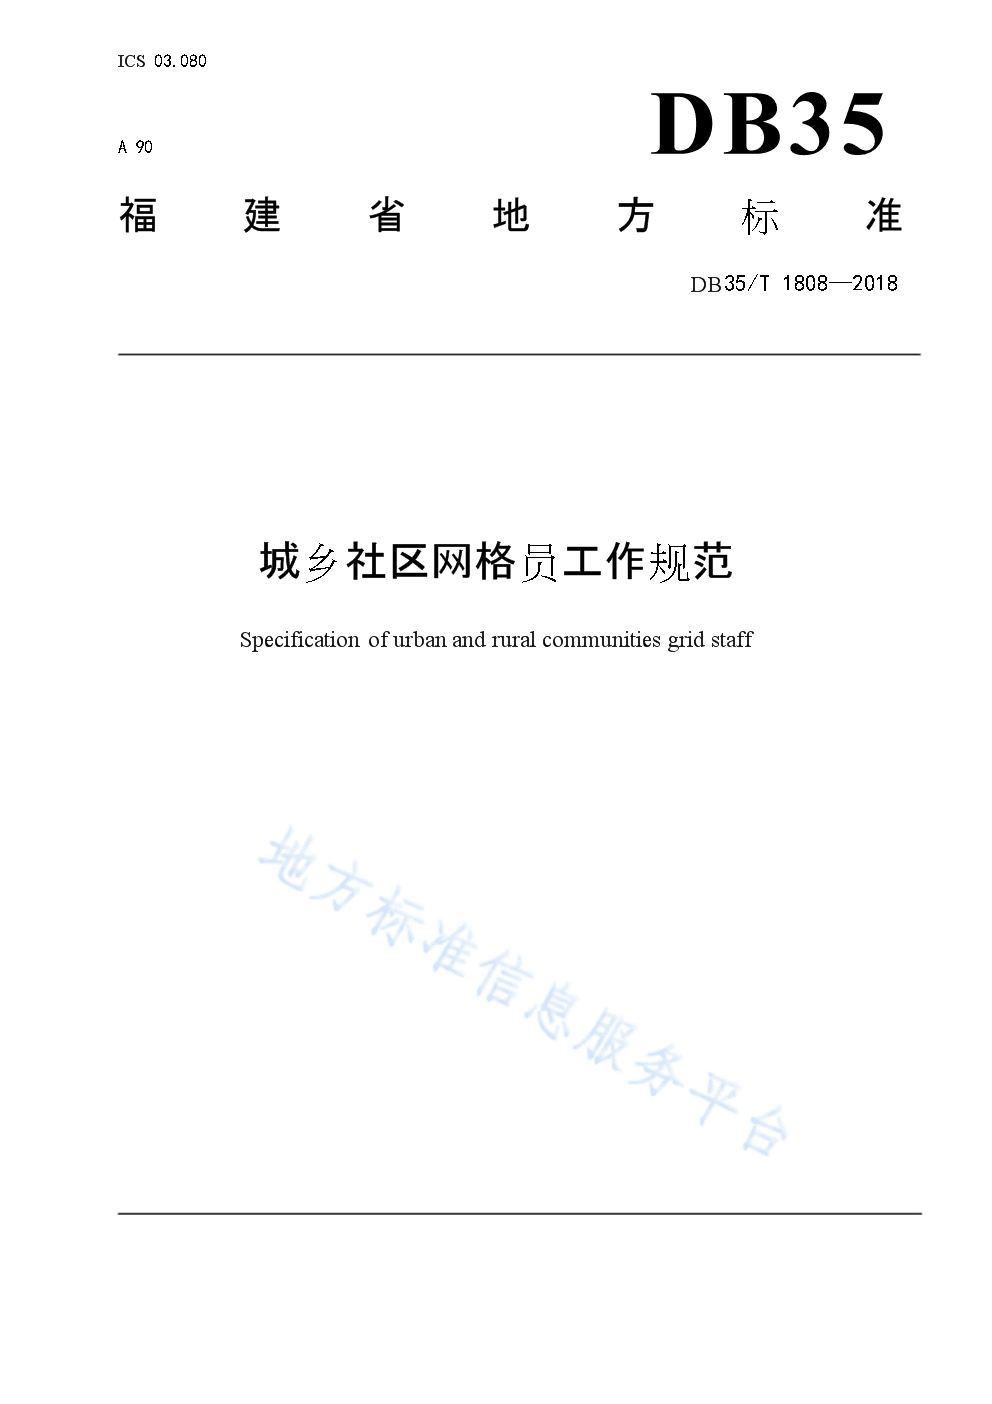 DB35_T 1808-2018城乡社区网格员工作规范.docx